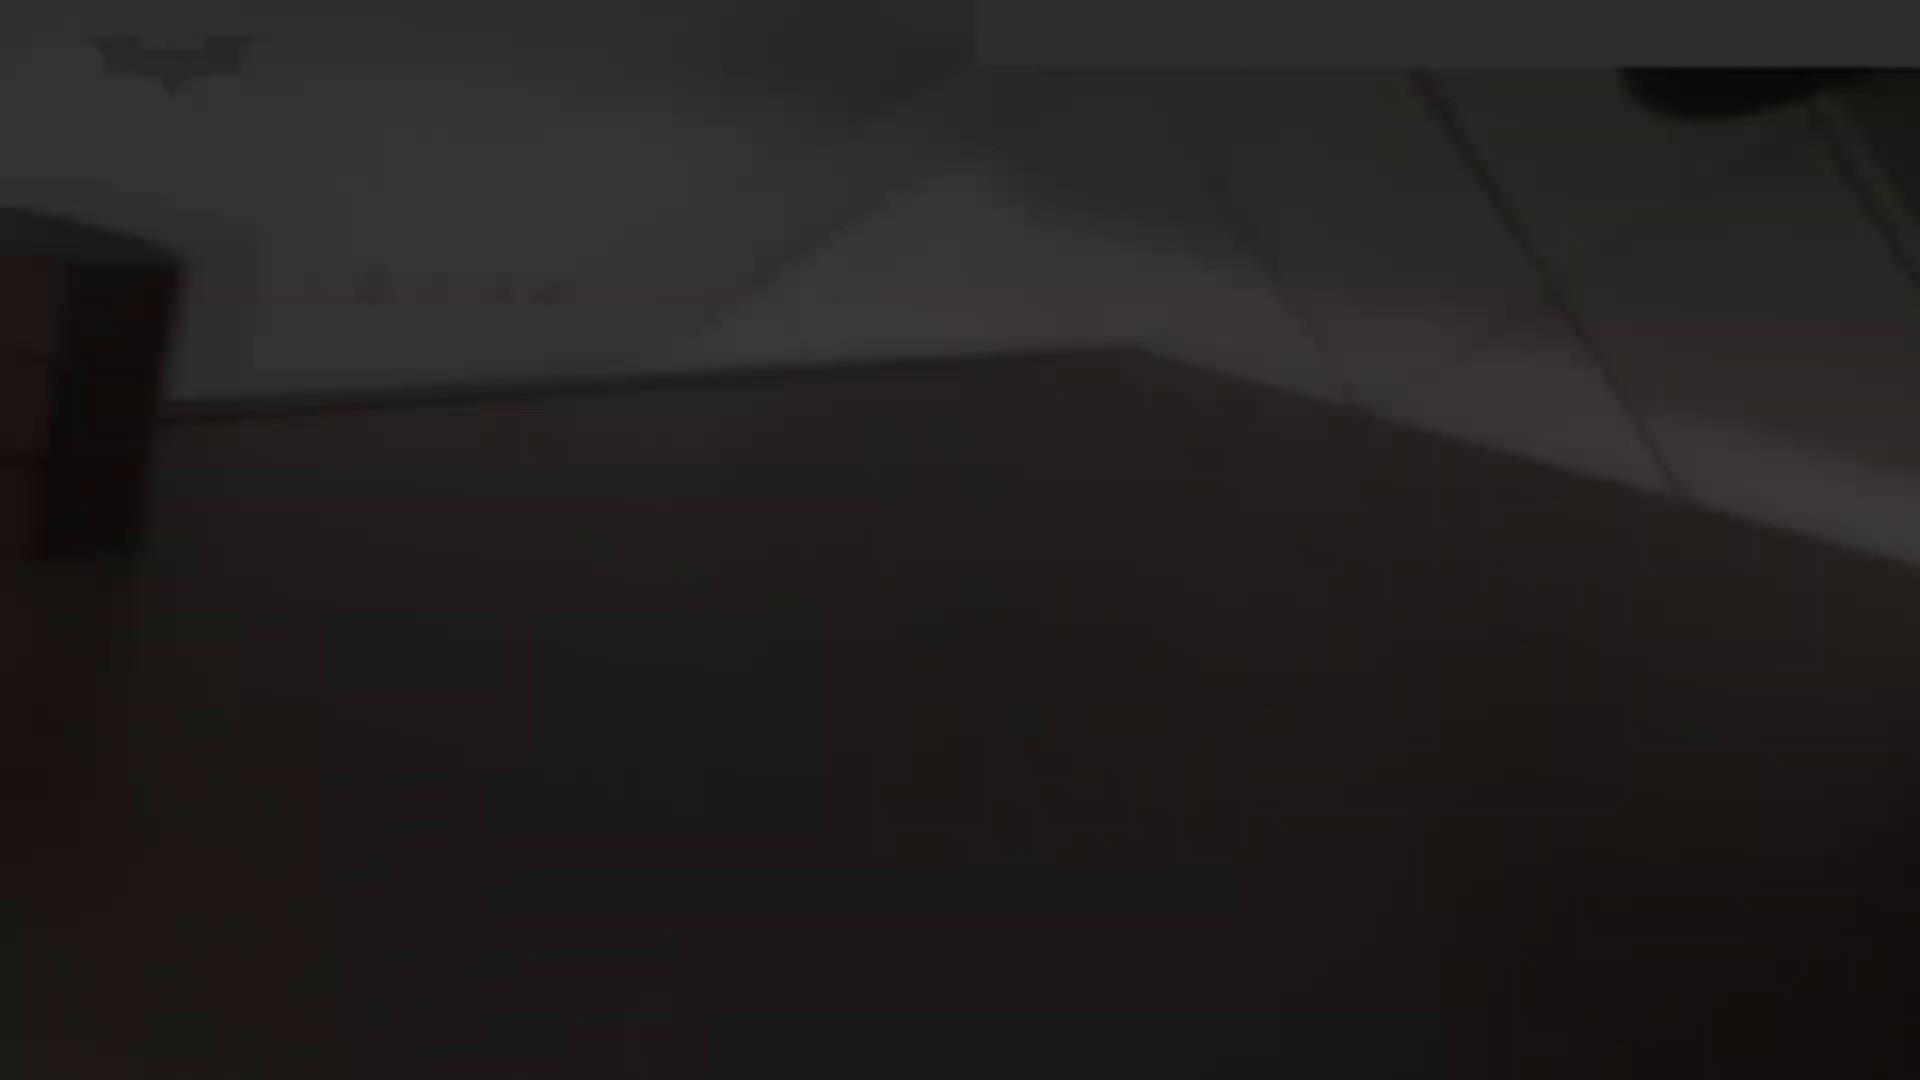 JD盗撮 美女の洗面所の秘密 Vol.14 女性トイレ | 0  100pic 1